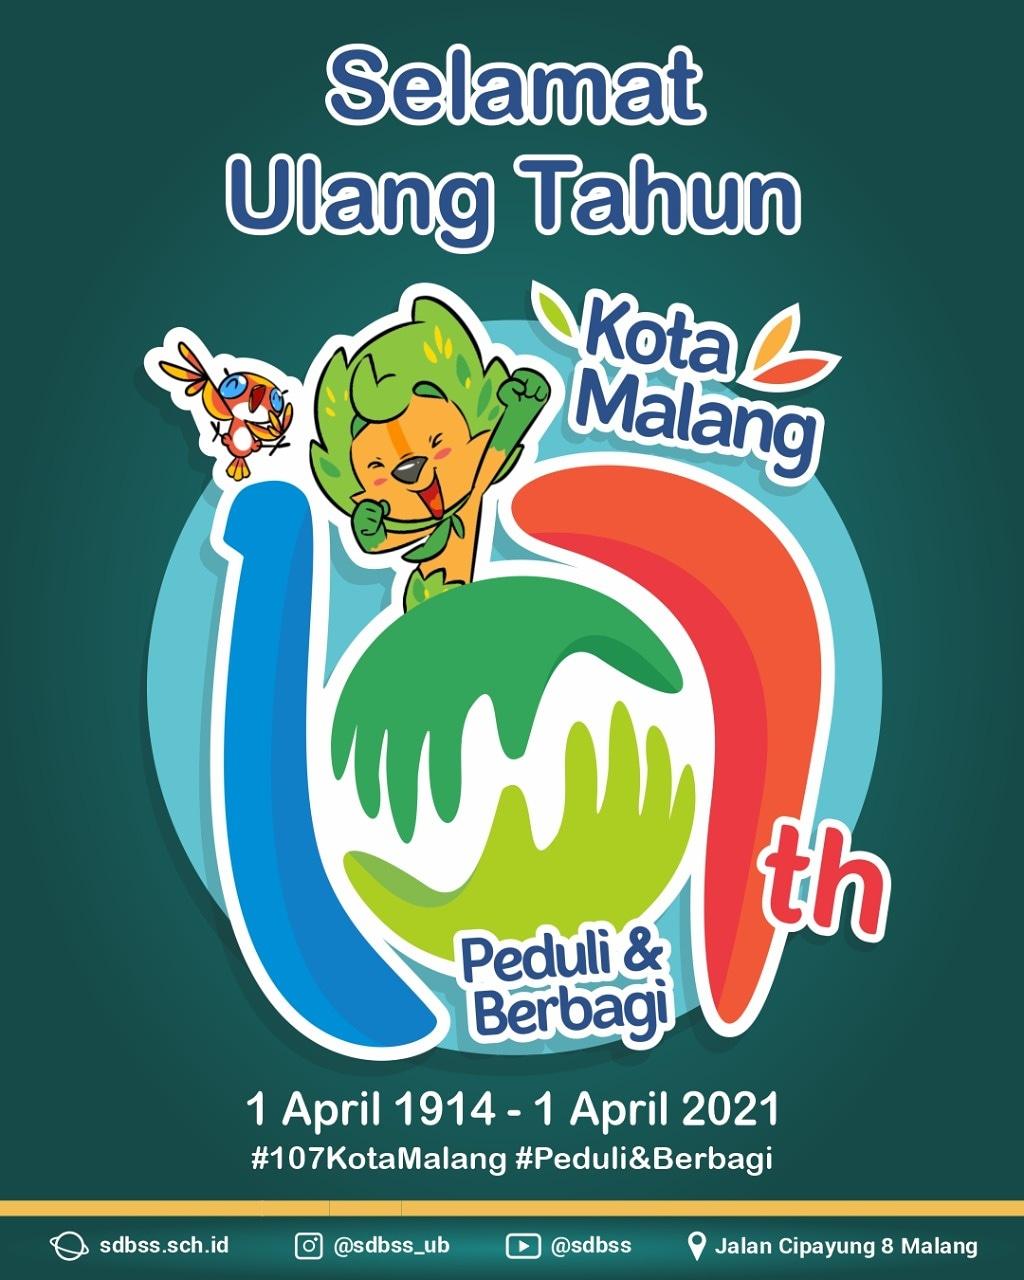 Hari Ulang Tahun Kota Malang ke 107